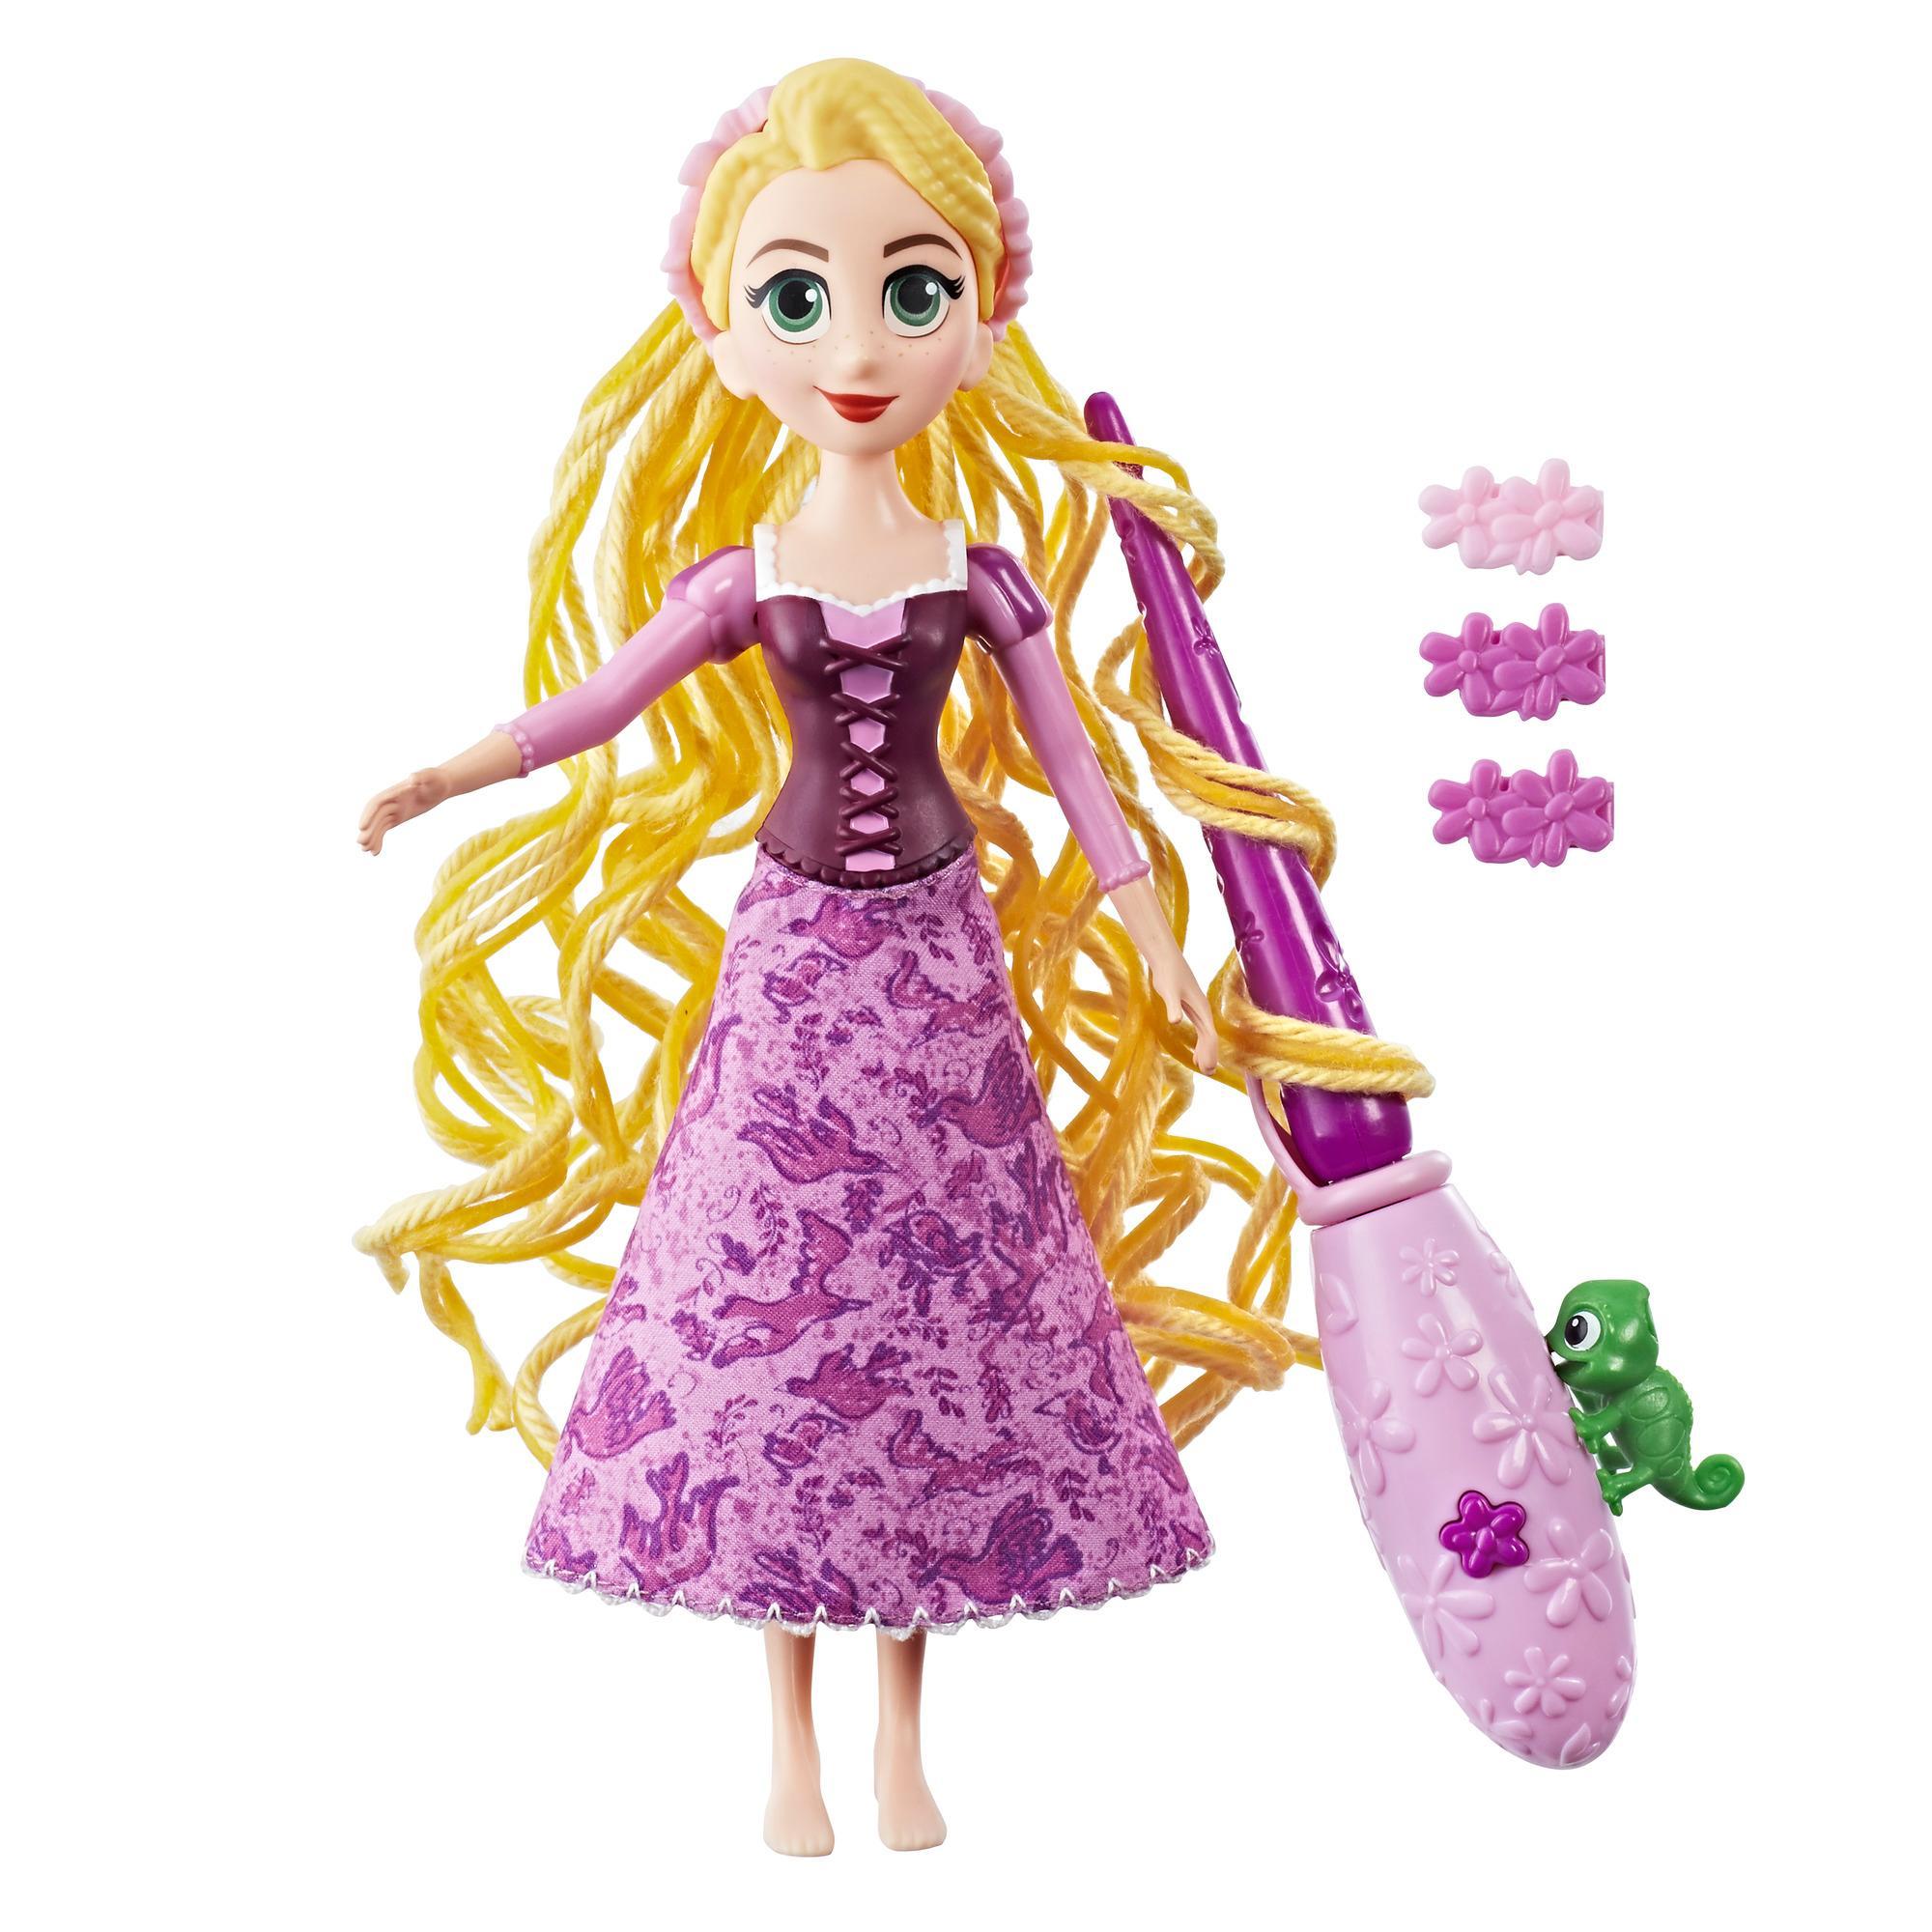 Disney Rapunzel – Die Serie Rapunzels Lockenpracht